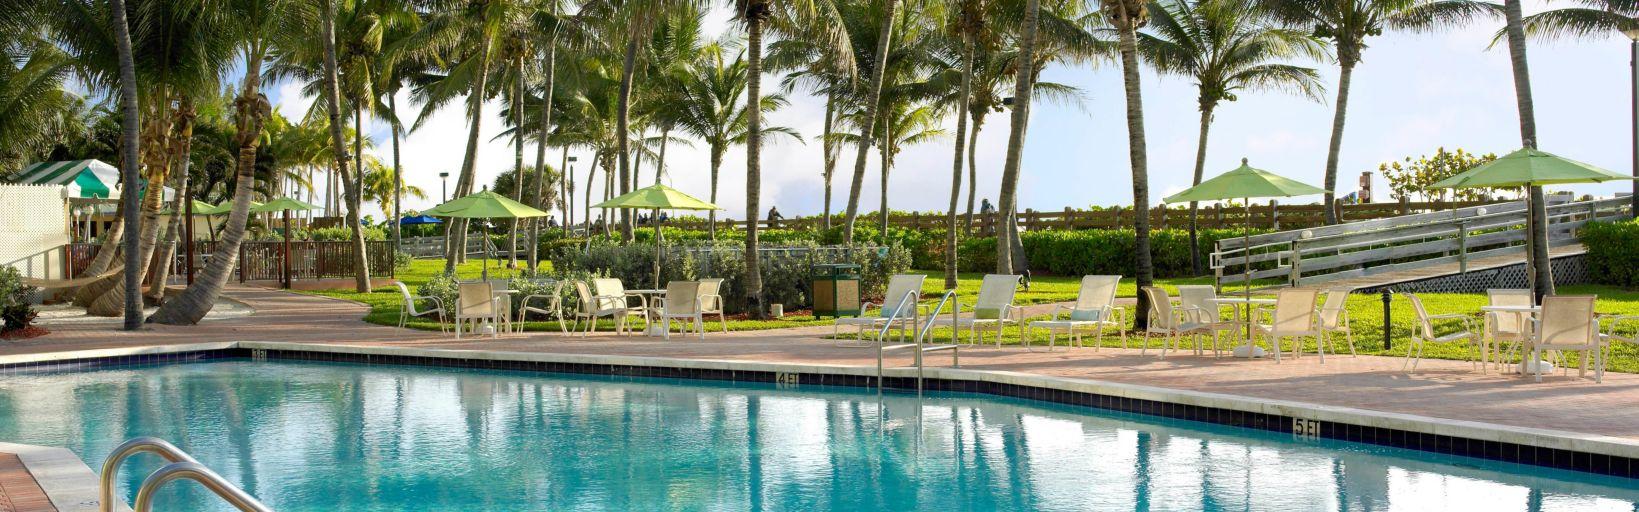 Holiday Inn Miami Beach piscina ao ar livre